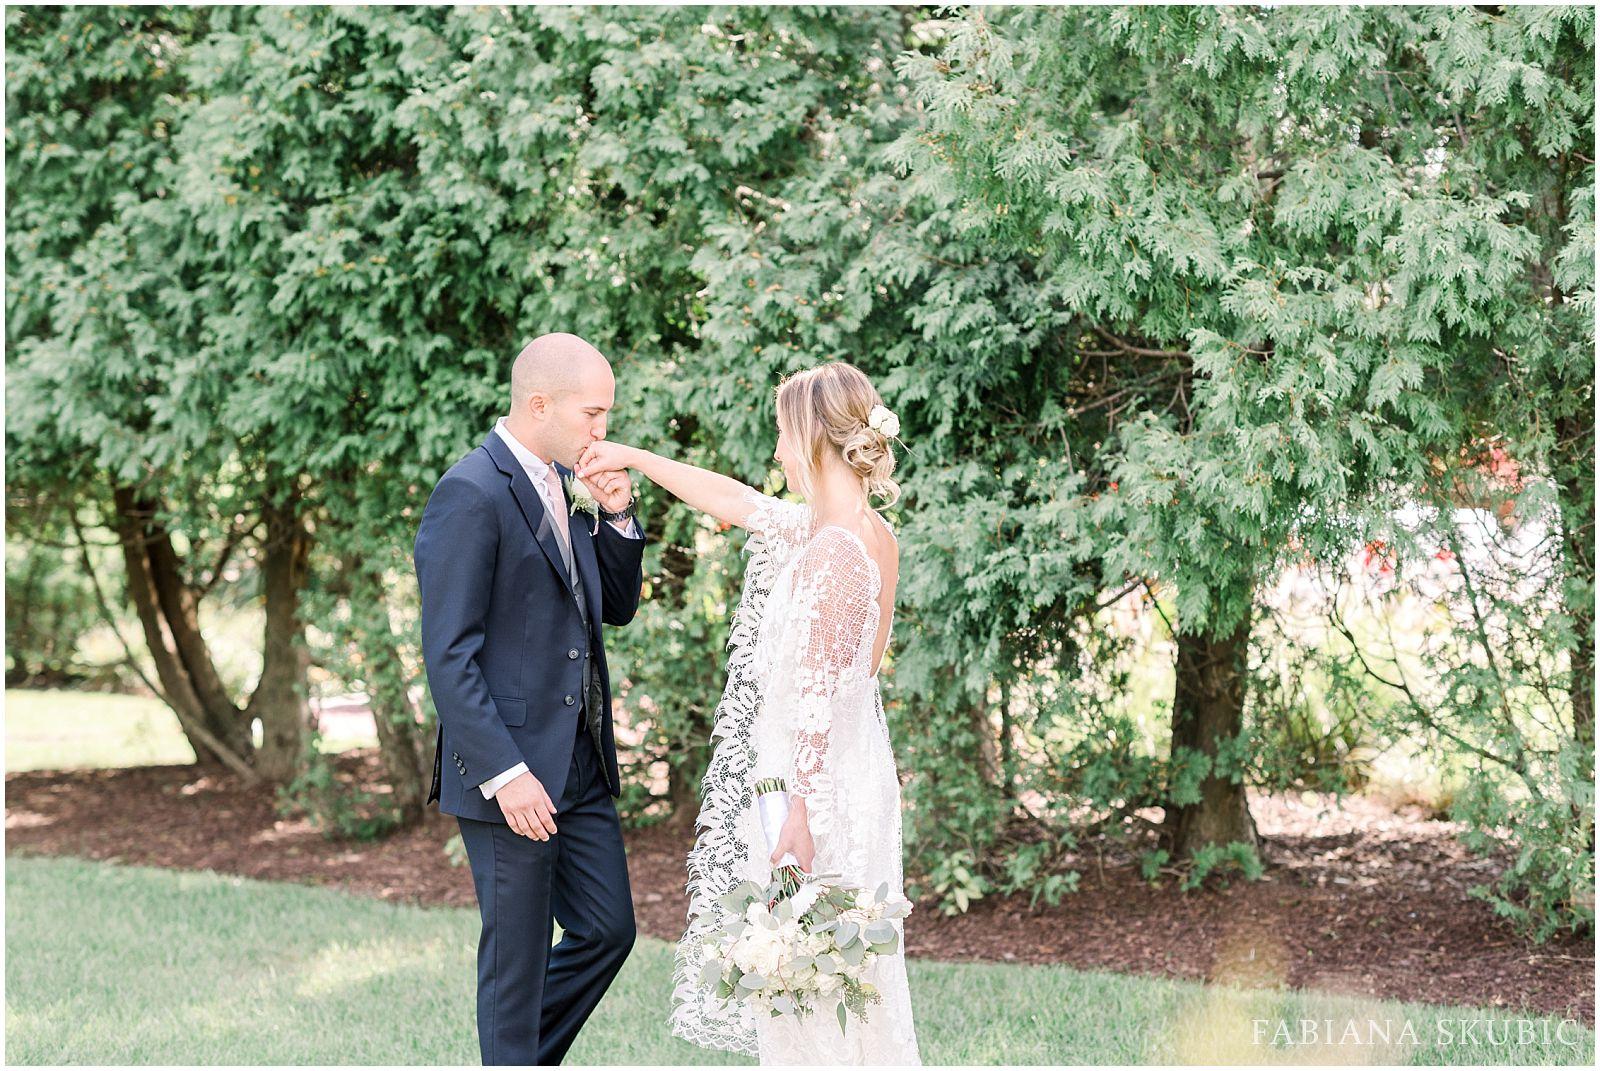 FabianaSkubic_H&M_Wedding_0018.jpg